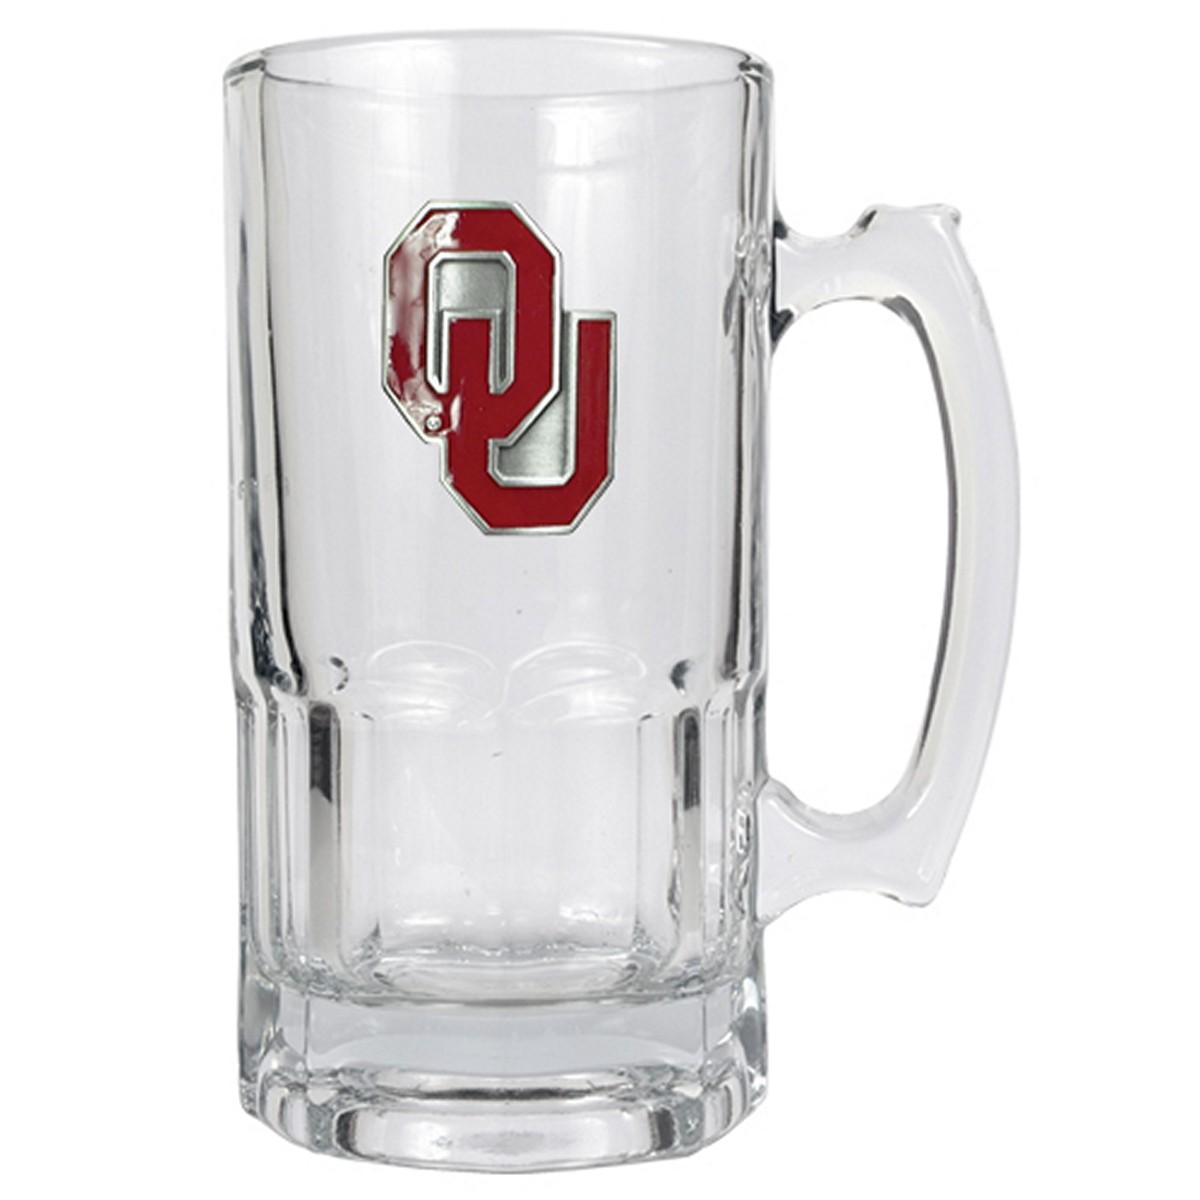 Oklahoma Sooners Large Beer Mug (Engravable)